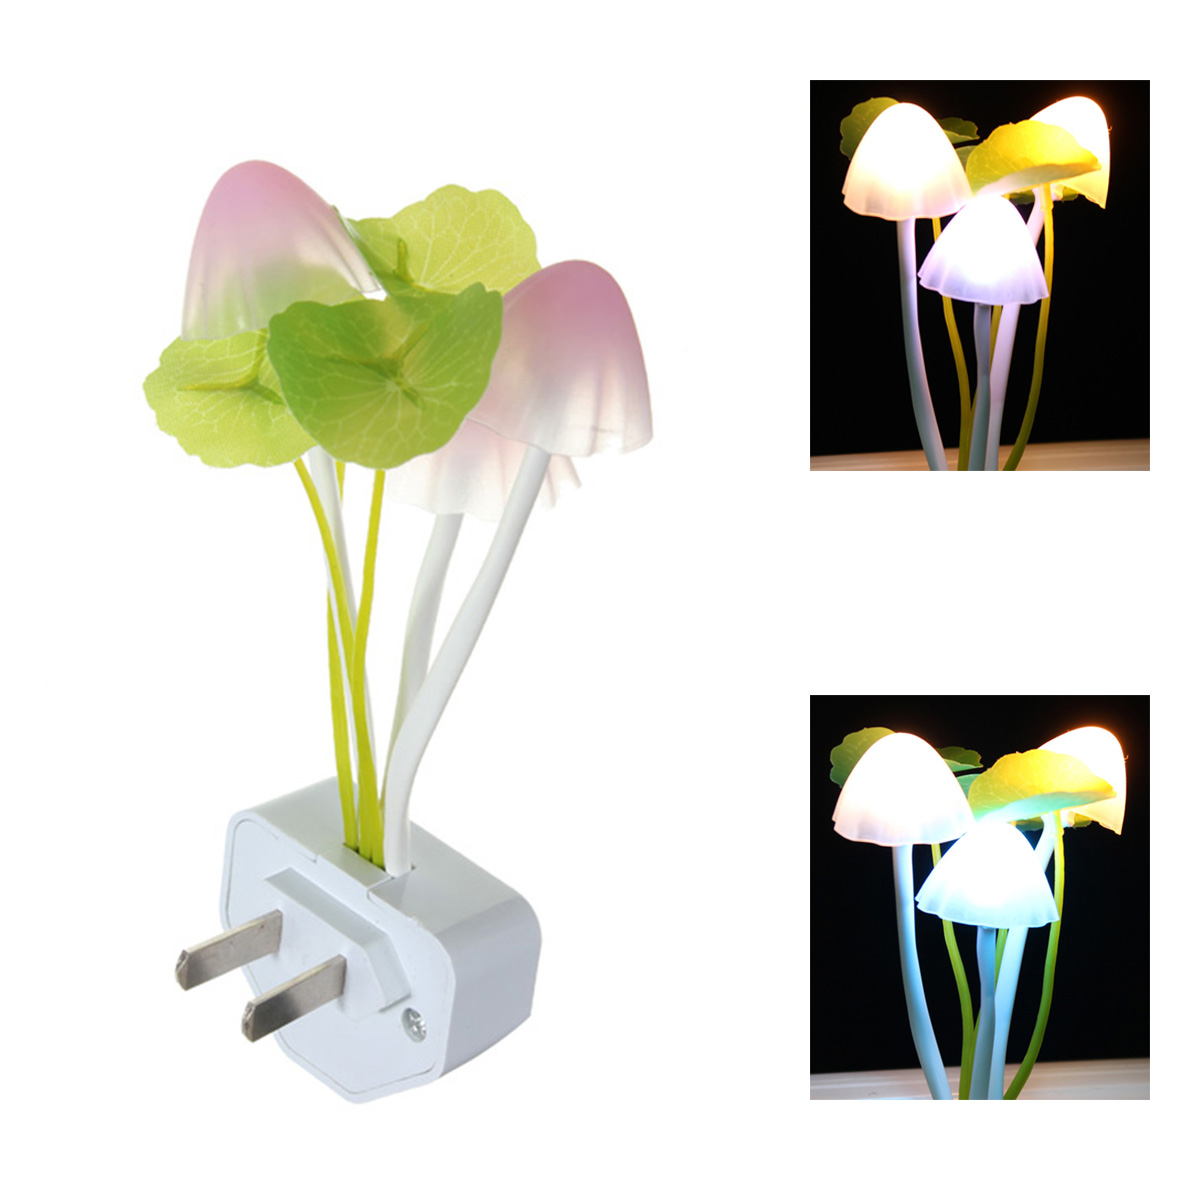 Mushroom Fungus LED Night Light US/EU Plug Light Sensor 110-220V 3 LED Colorful Wireless Wall Lamp for Baby Children Nightlight